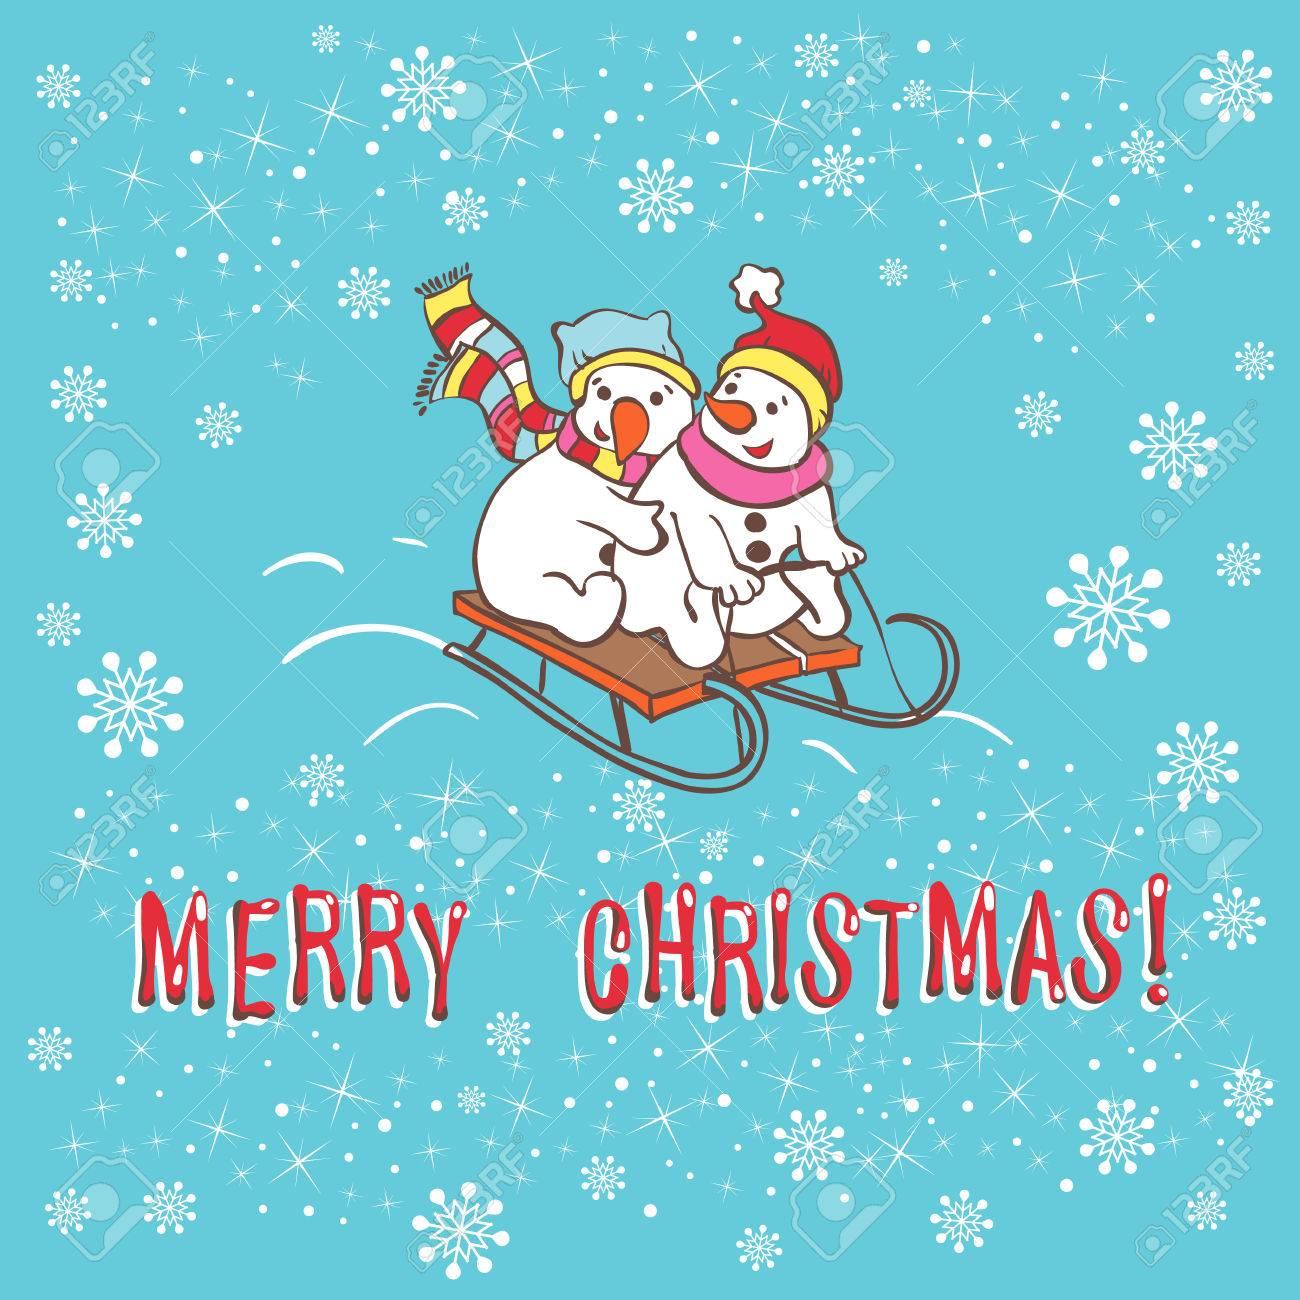 Christmas Greeting Card Snowman Template For Christmas Winter